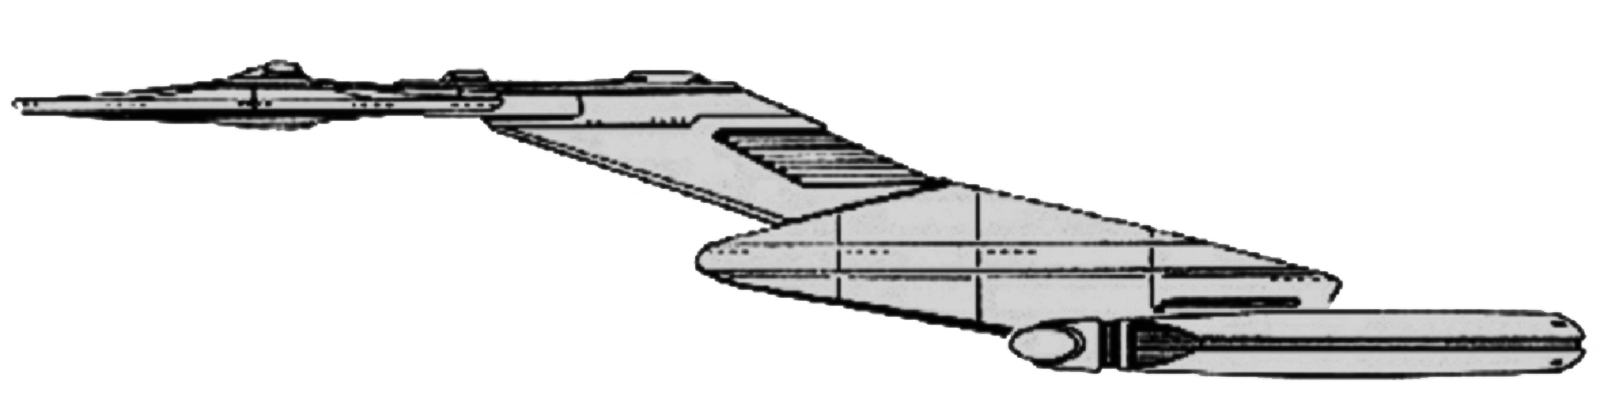 File:Wellington class sideview.jpg